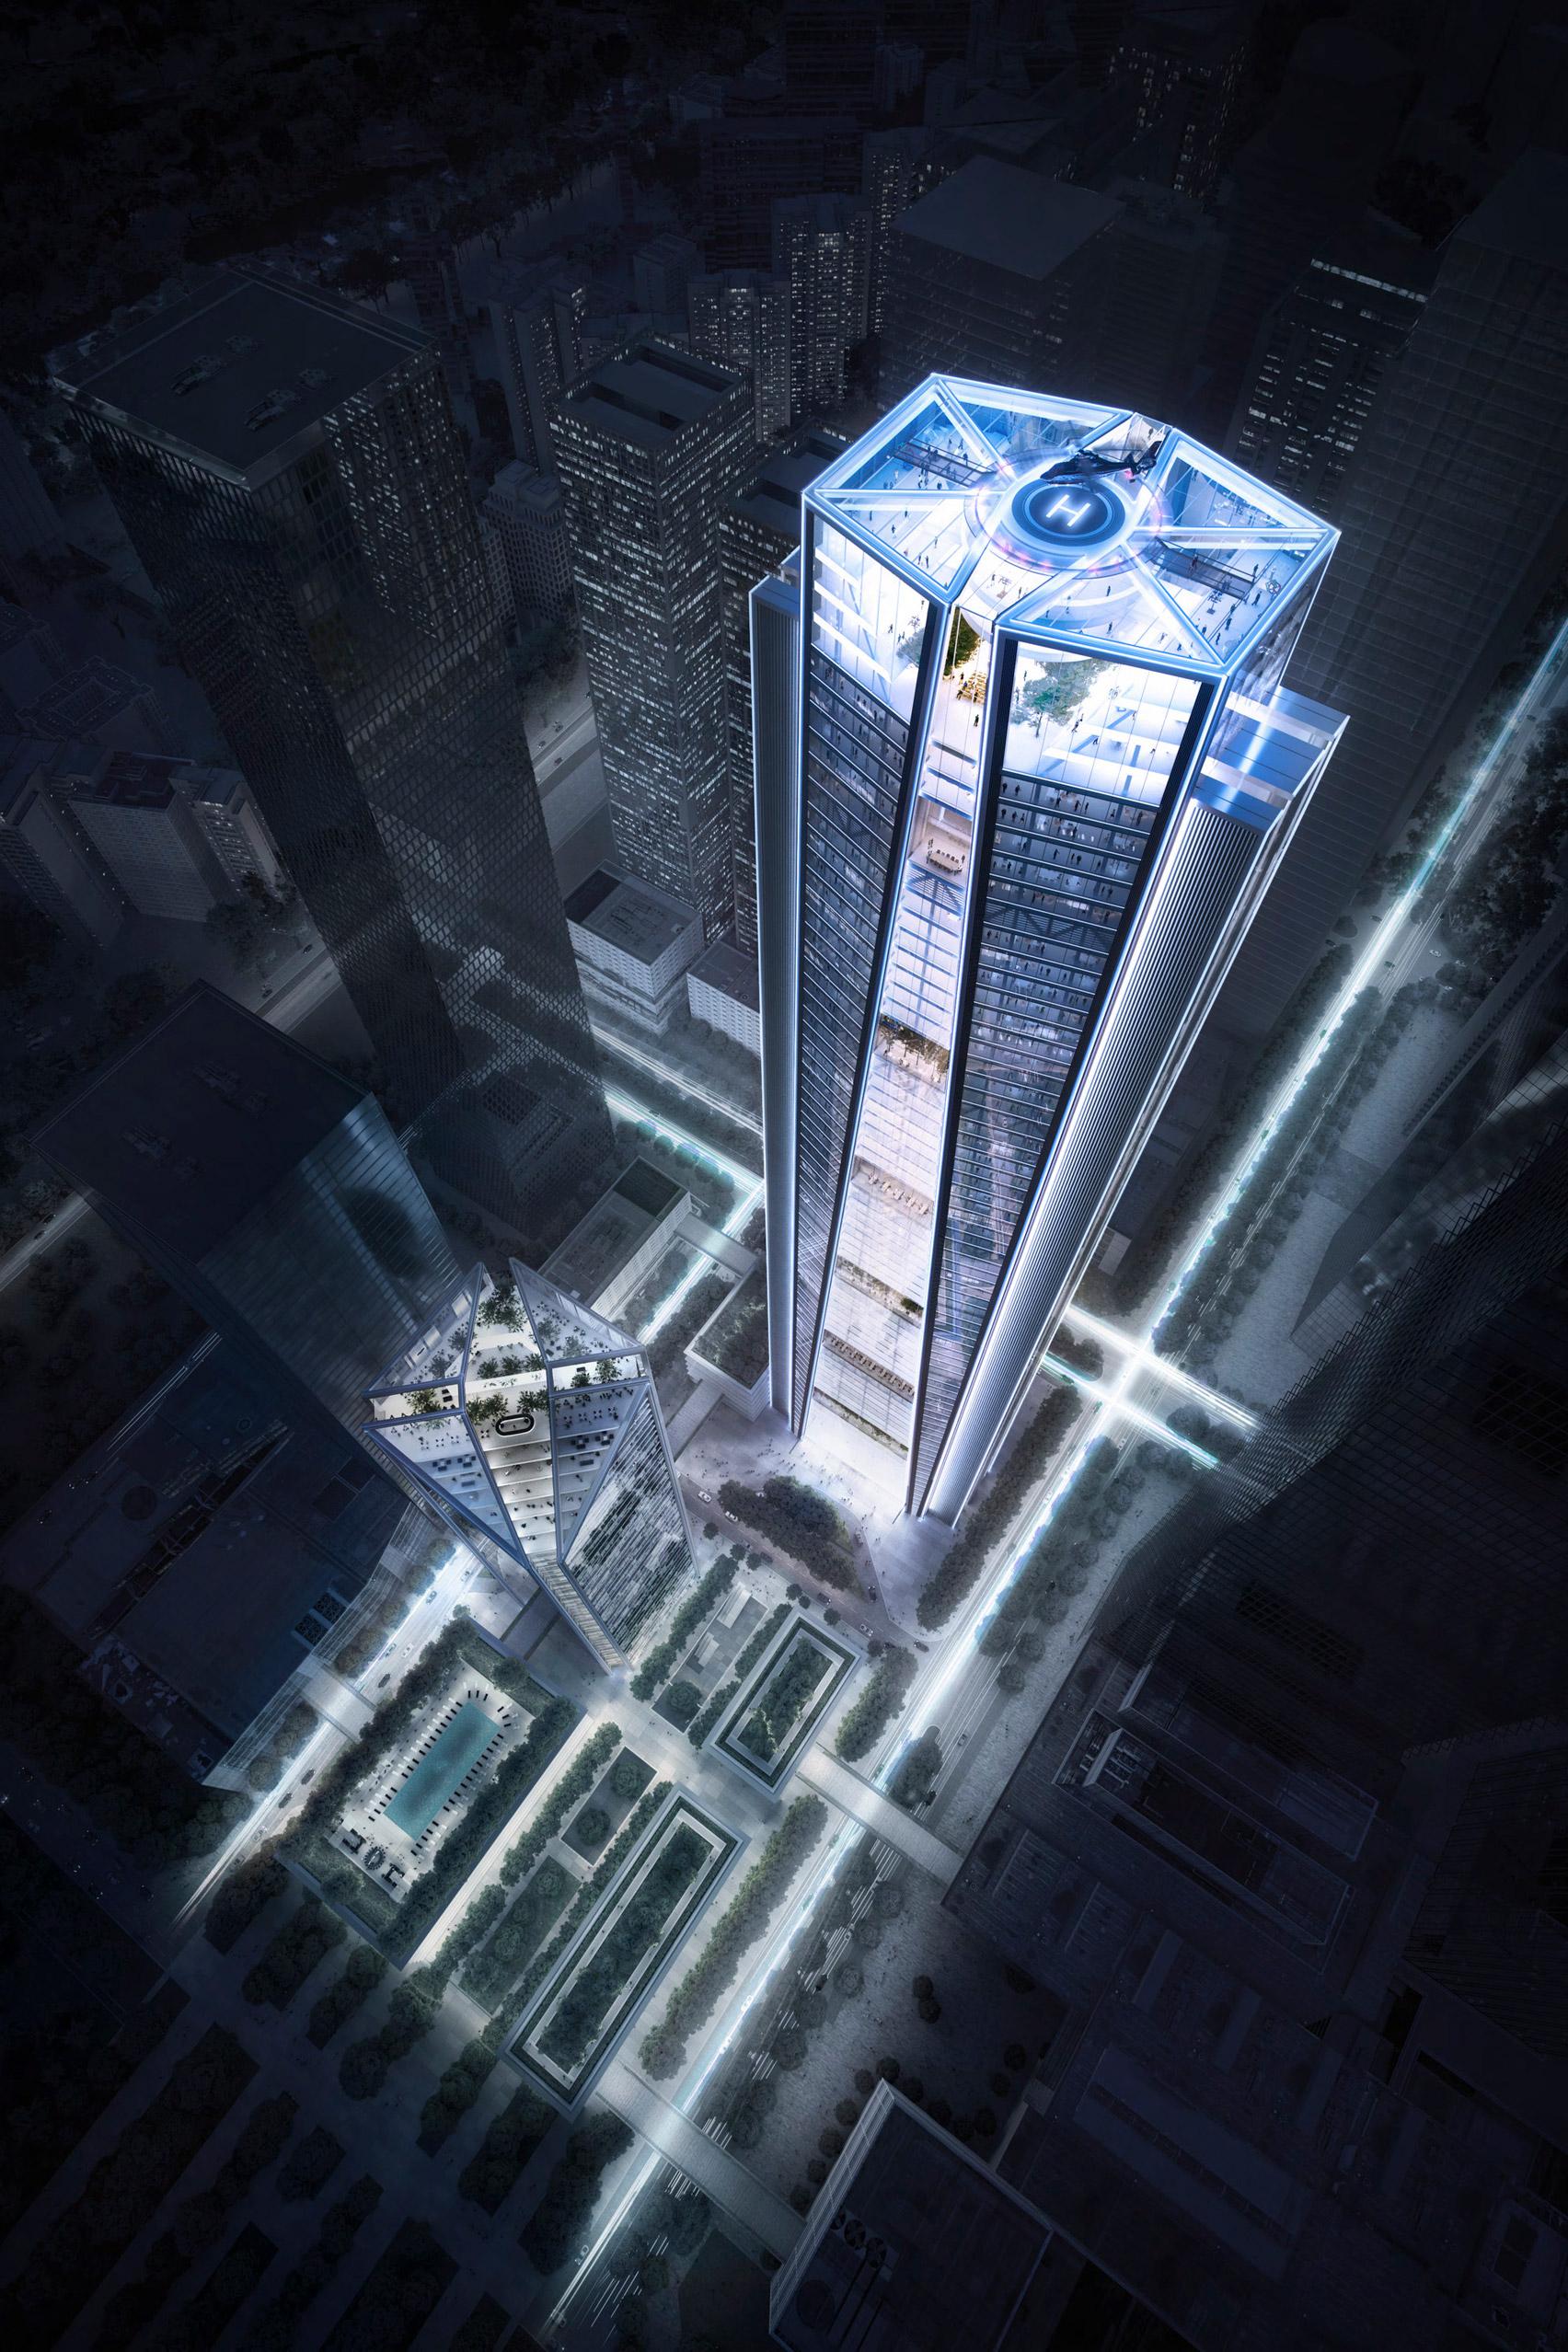 foster partners china merchants bank hq shenzhen skyscraper dezeen 1704 col 0